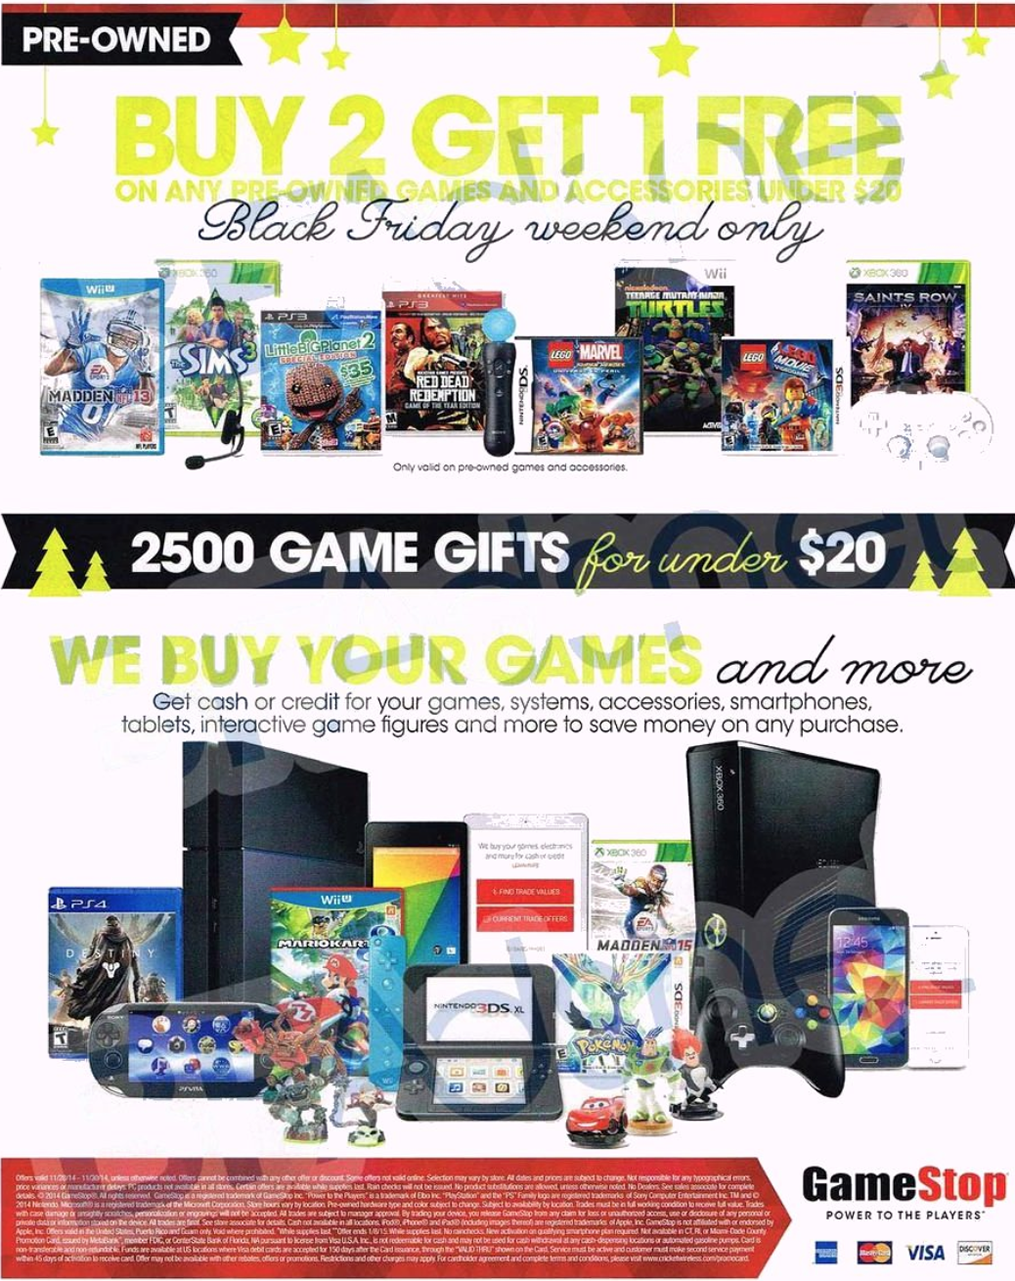 Gamestop Black Friday 2019 Ad, Sale & Deals - BlackerFriday.com